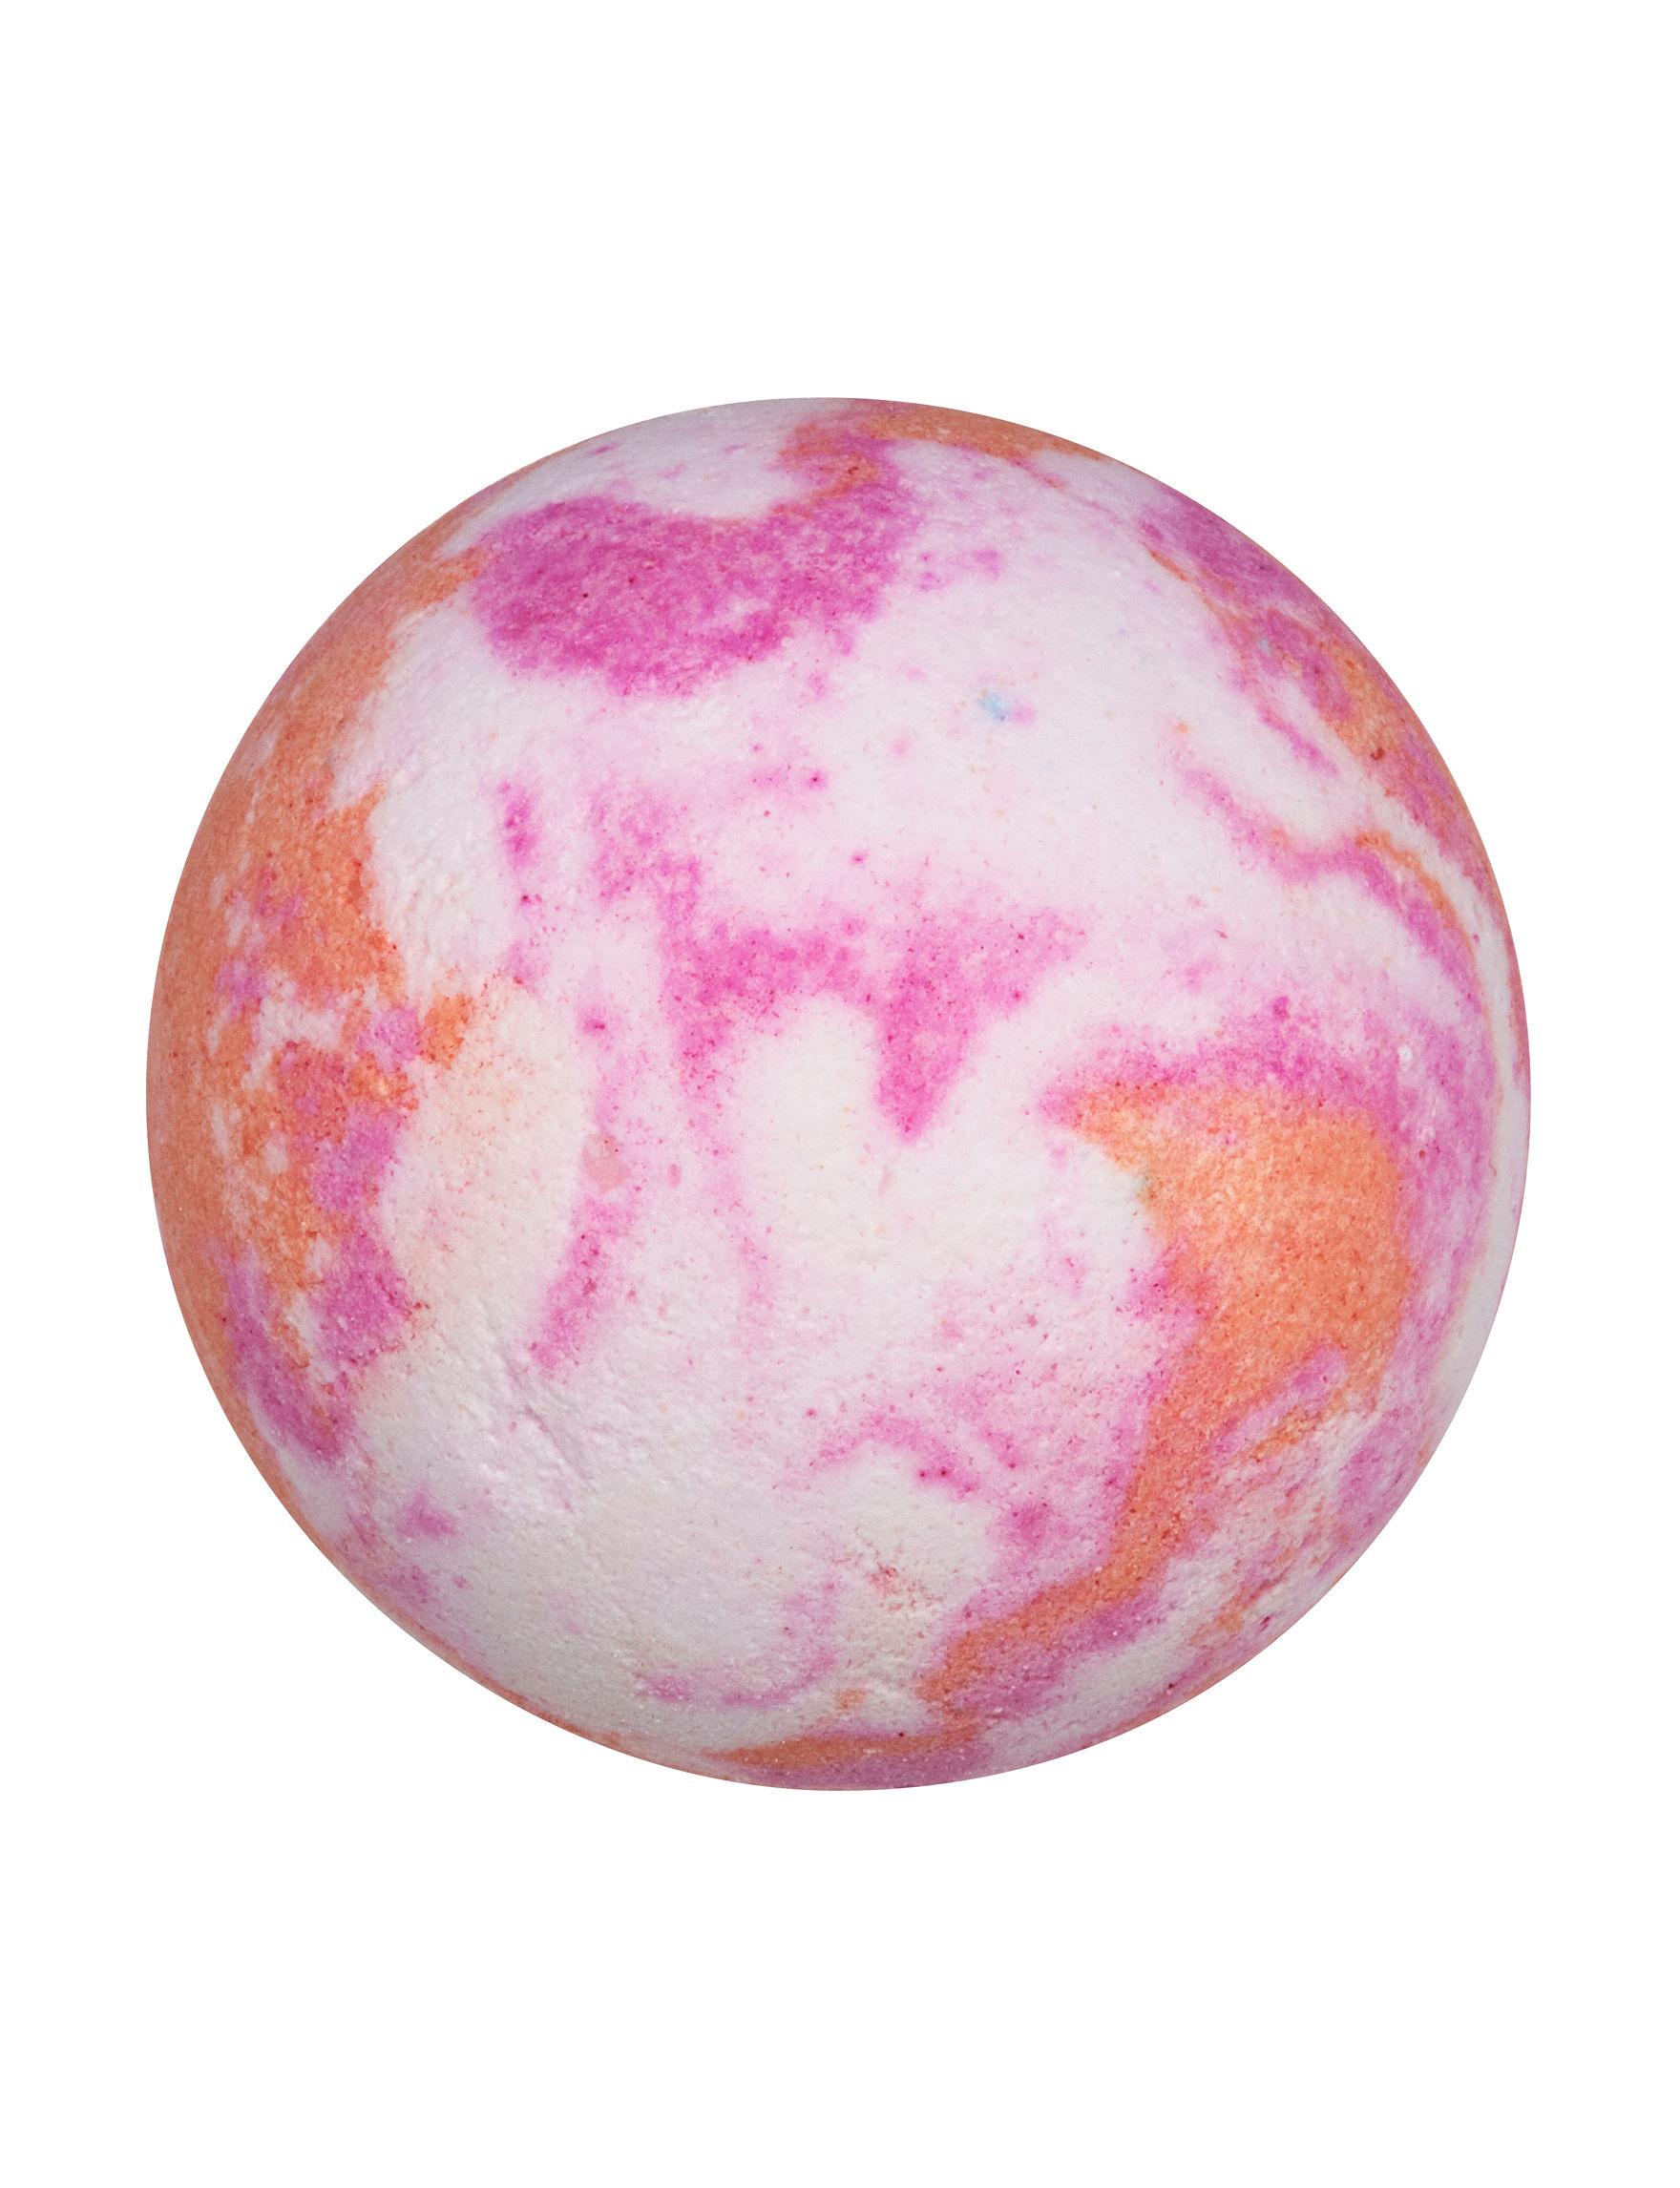 Fizz & Bubbles  Bath Bombs, Salts & Oils